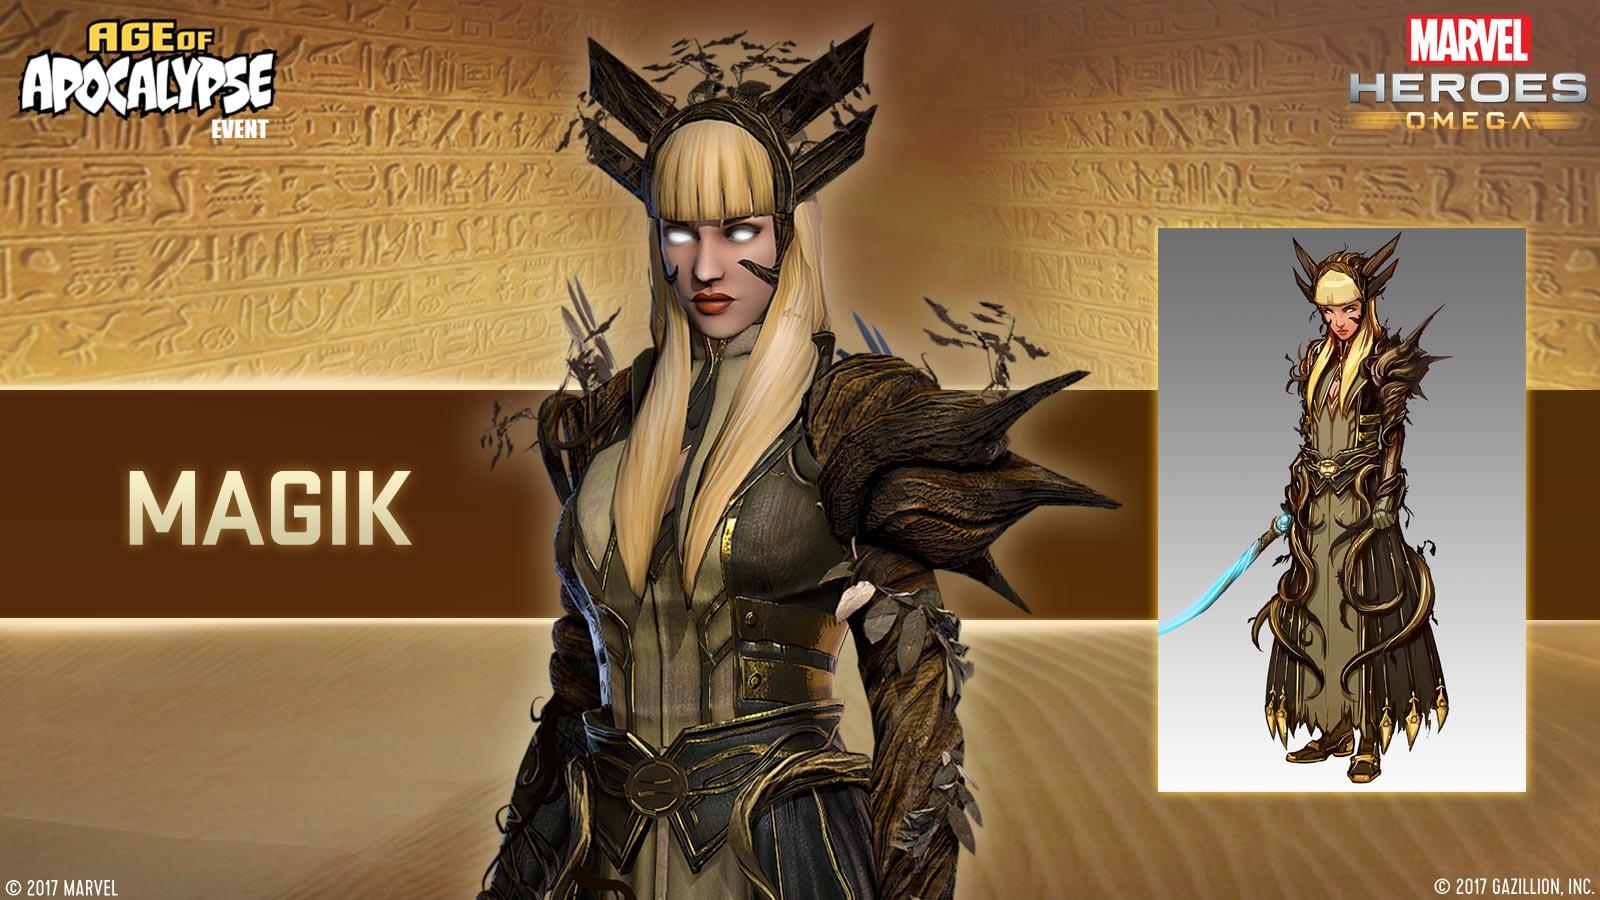 Official Magik Horsemen character press release graphic.